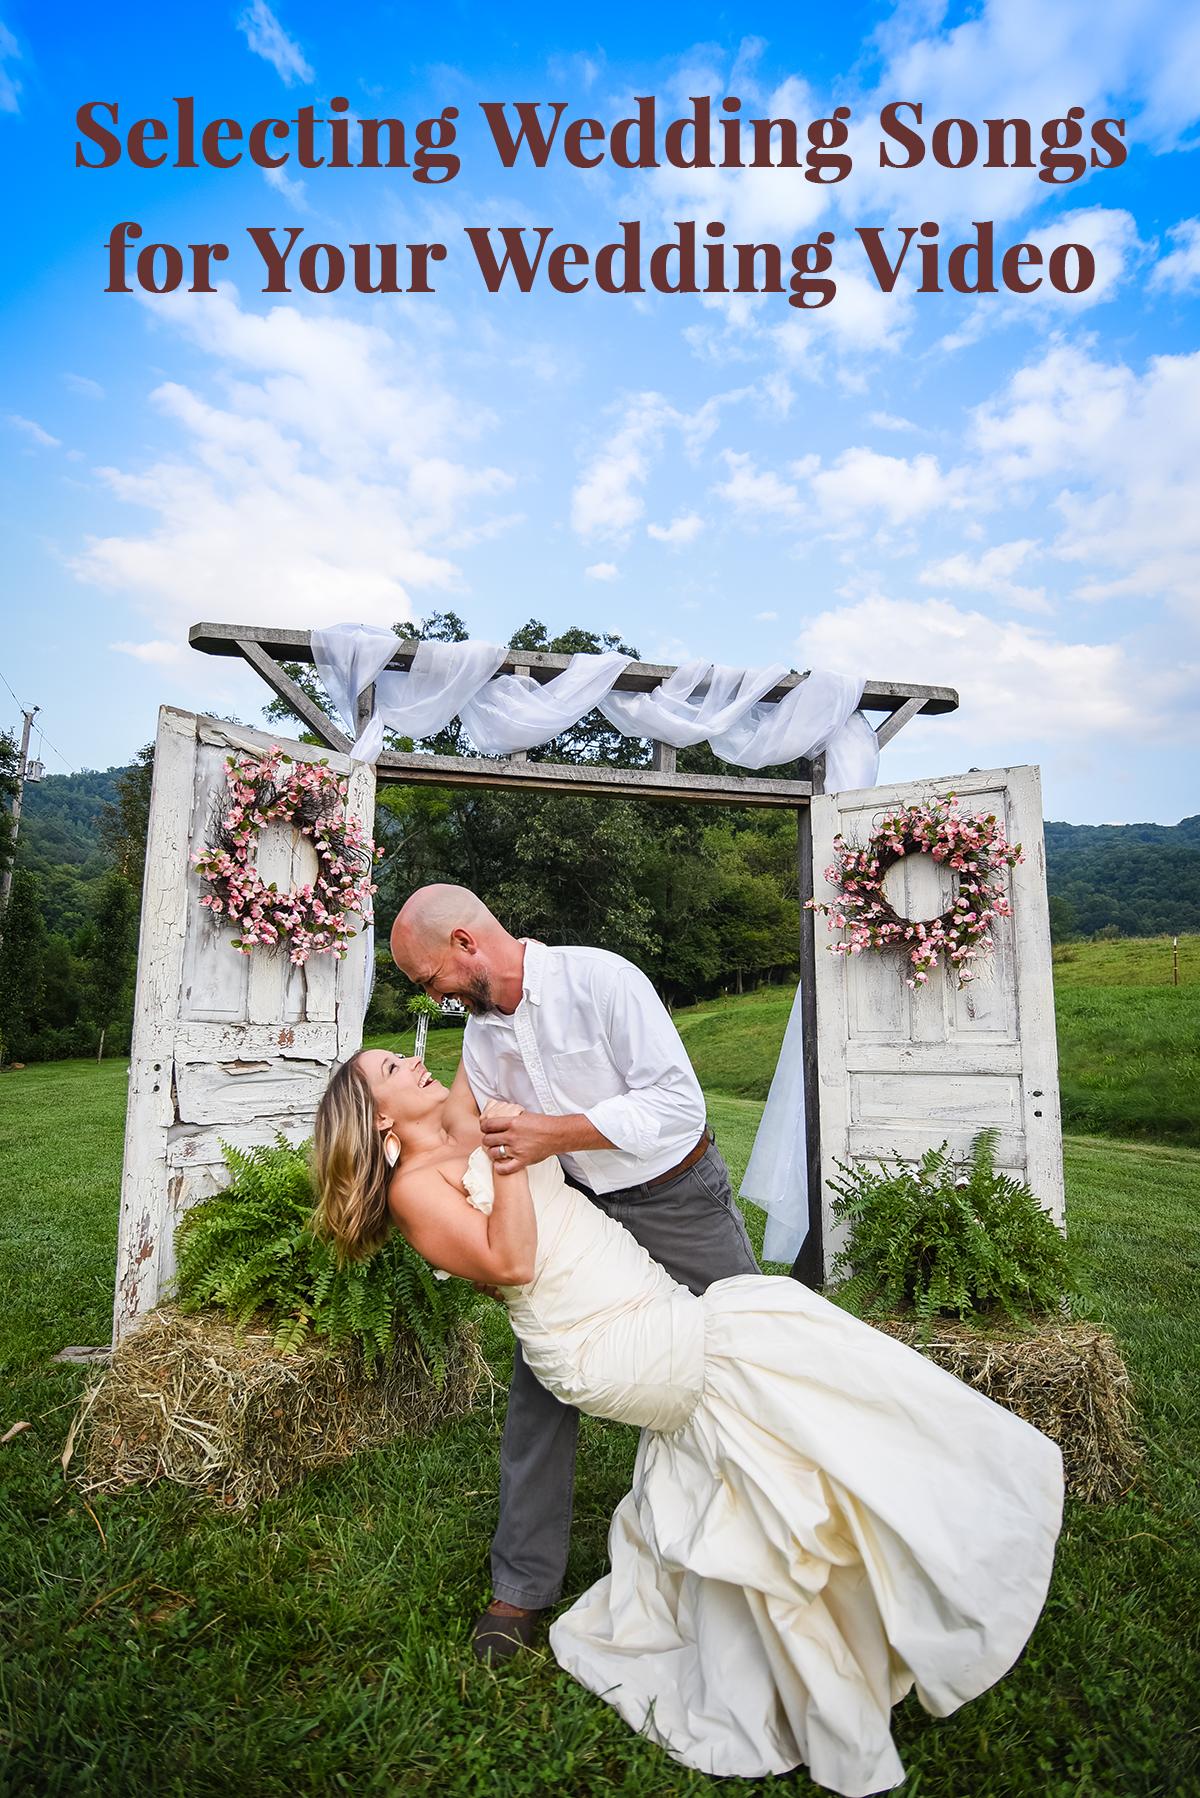 Wedding Video Songs.Selecting Wedding Songs For Your Wedding Video Wildwood Media